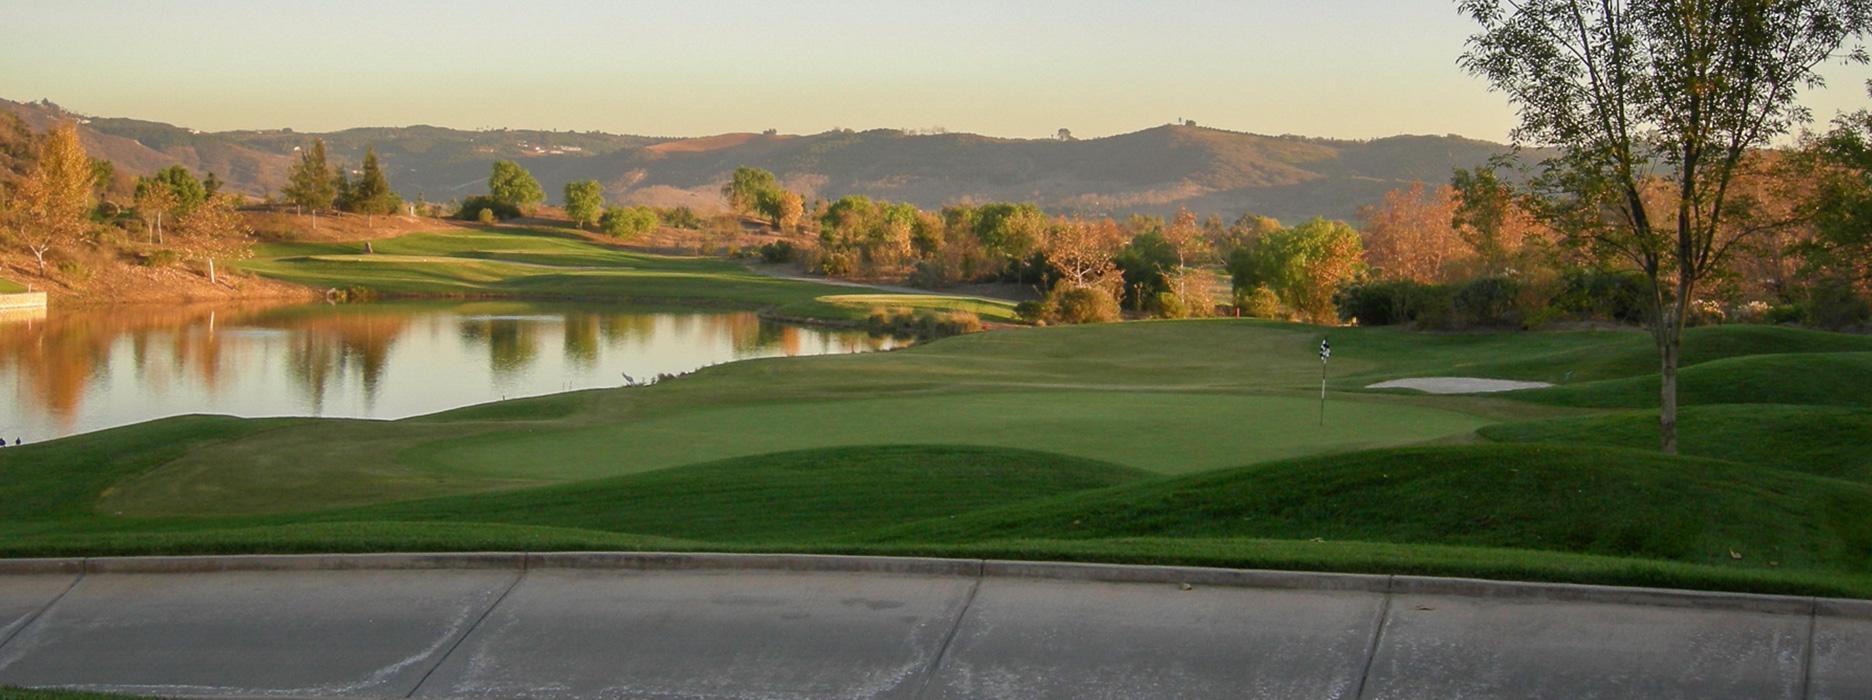 The Golf Club of California in Fallbrook